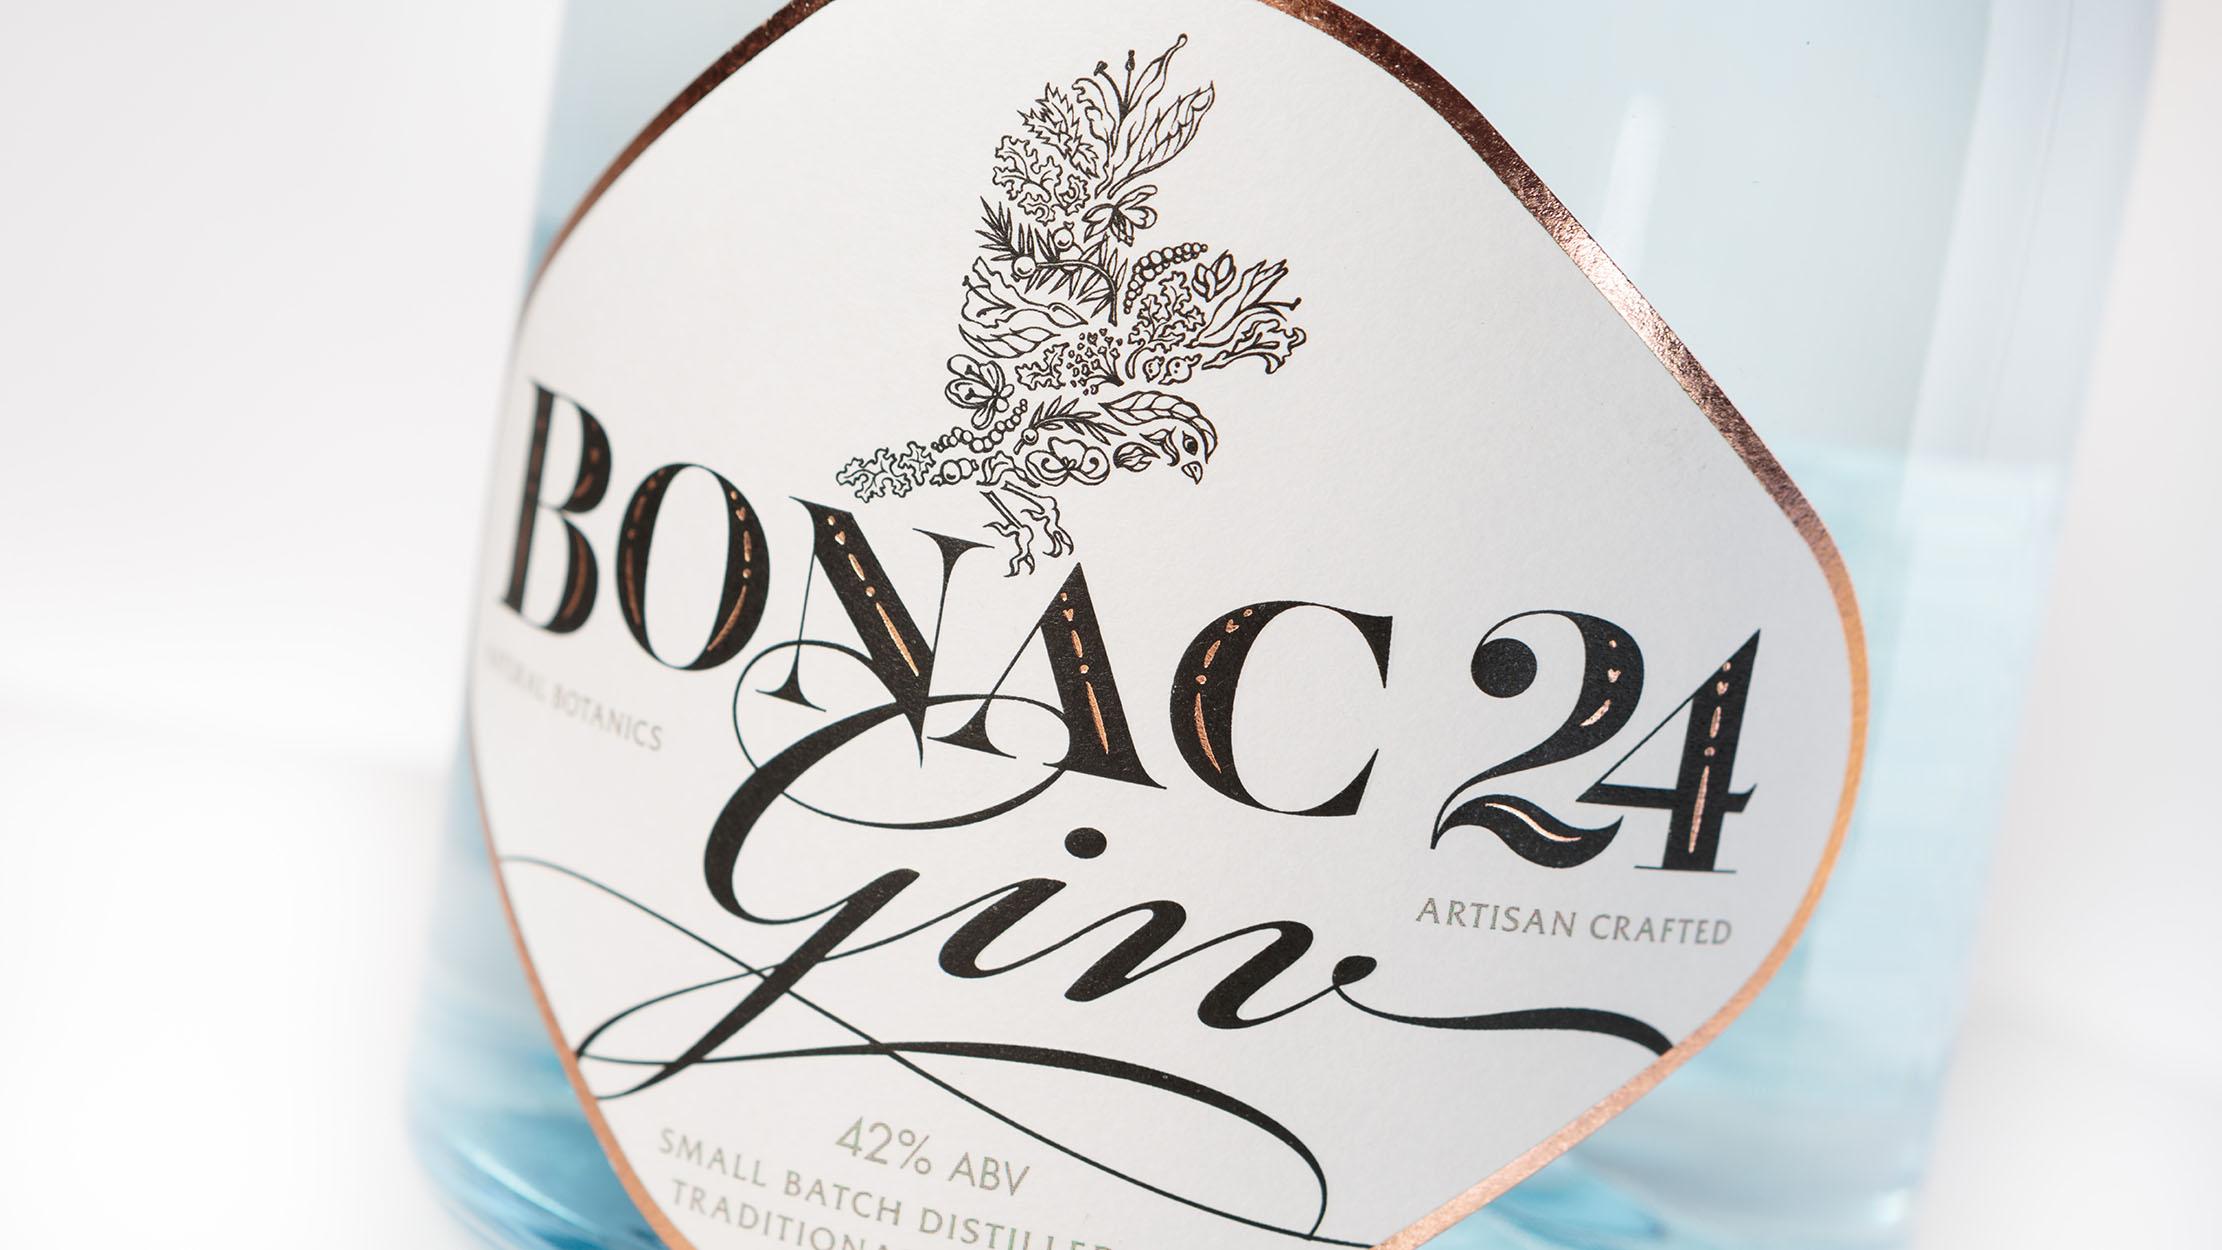 Bonac 24 Gin -2